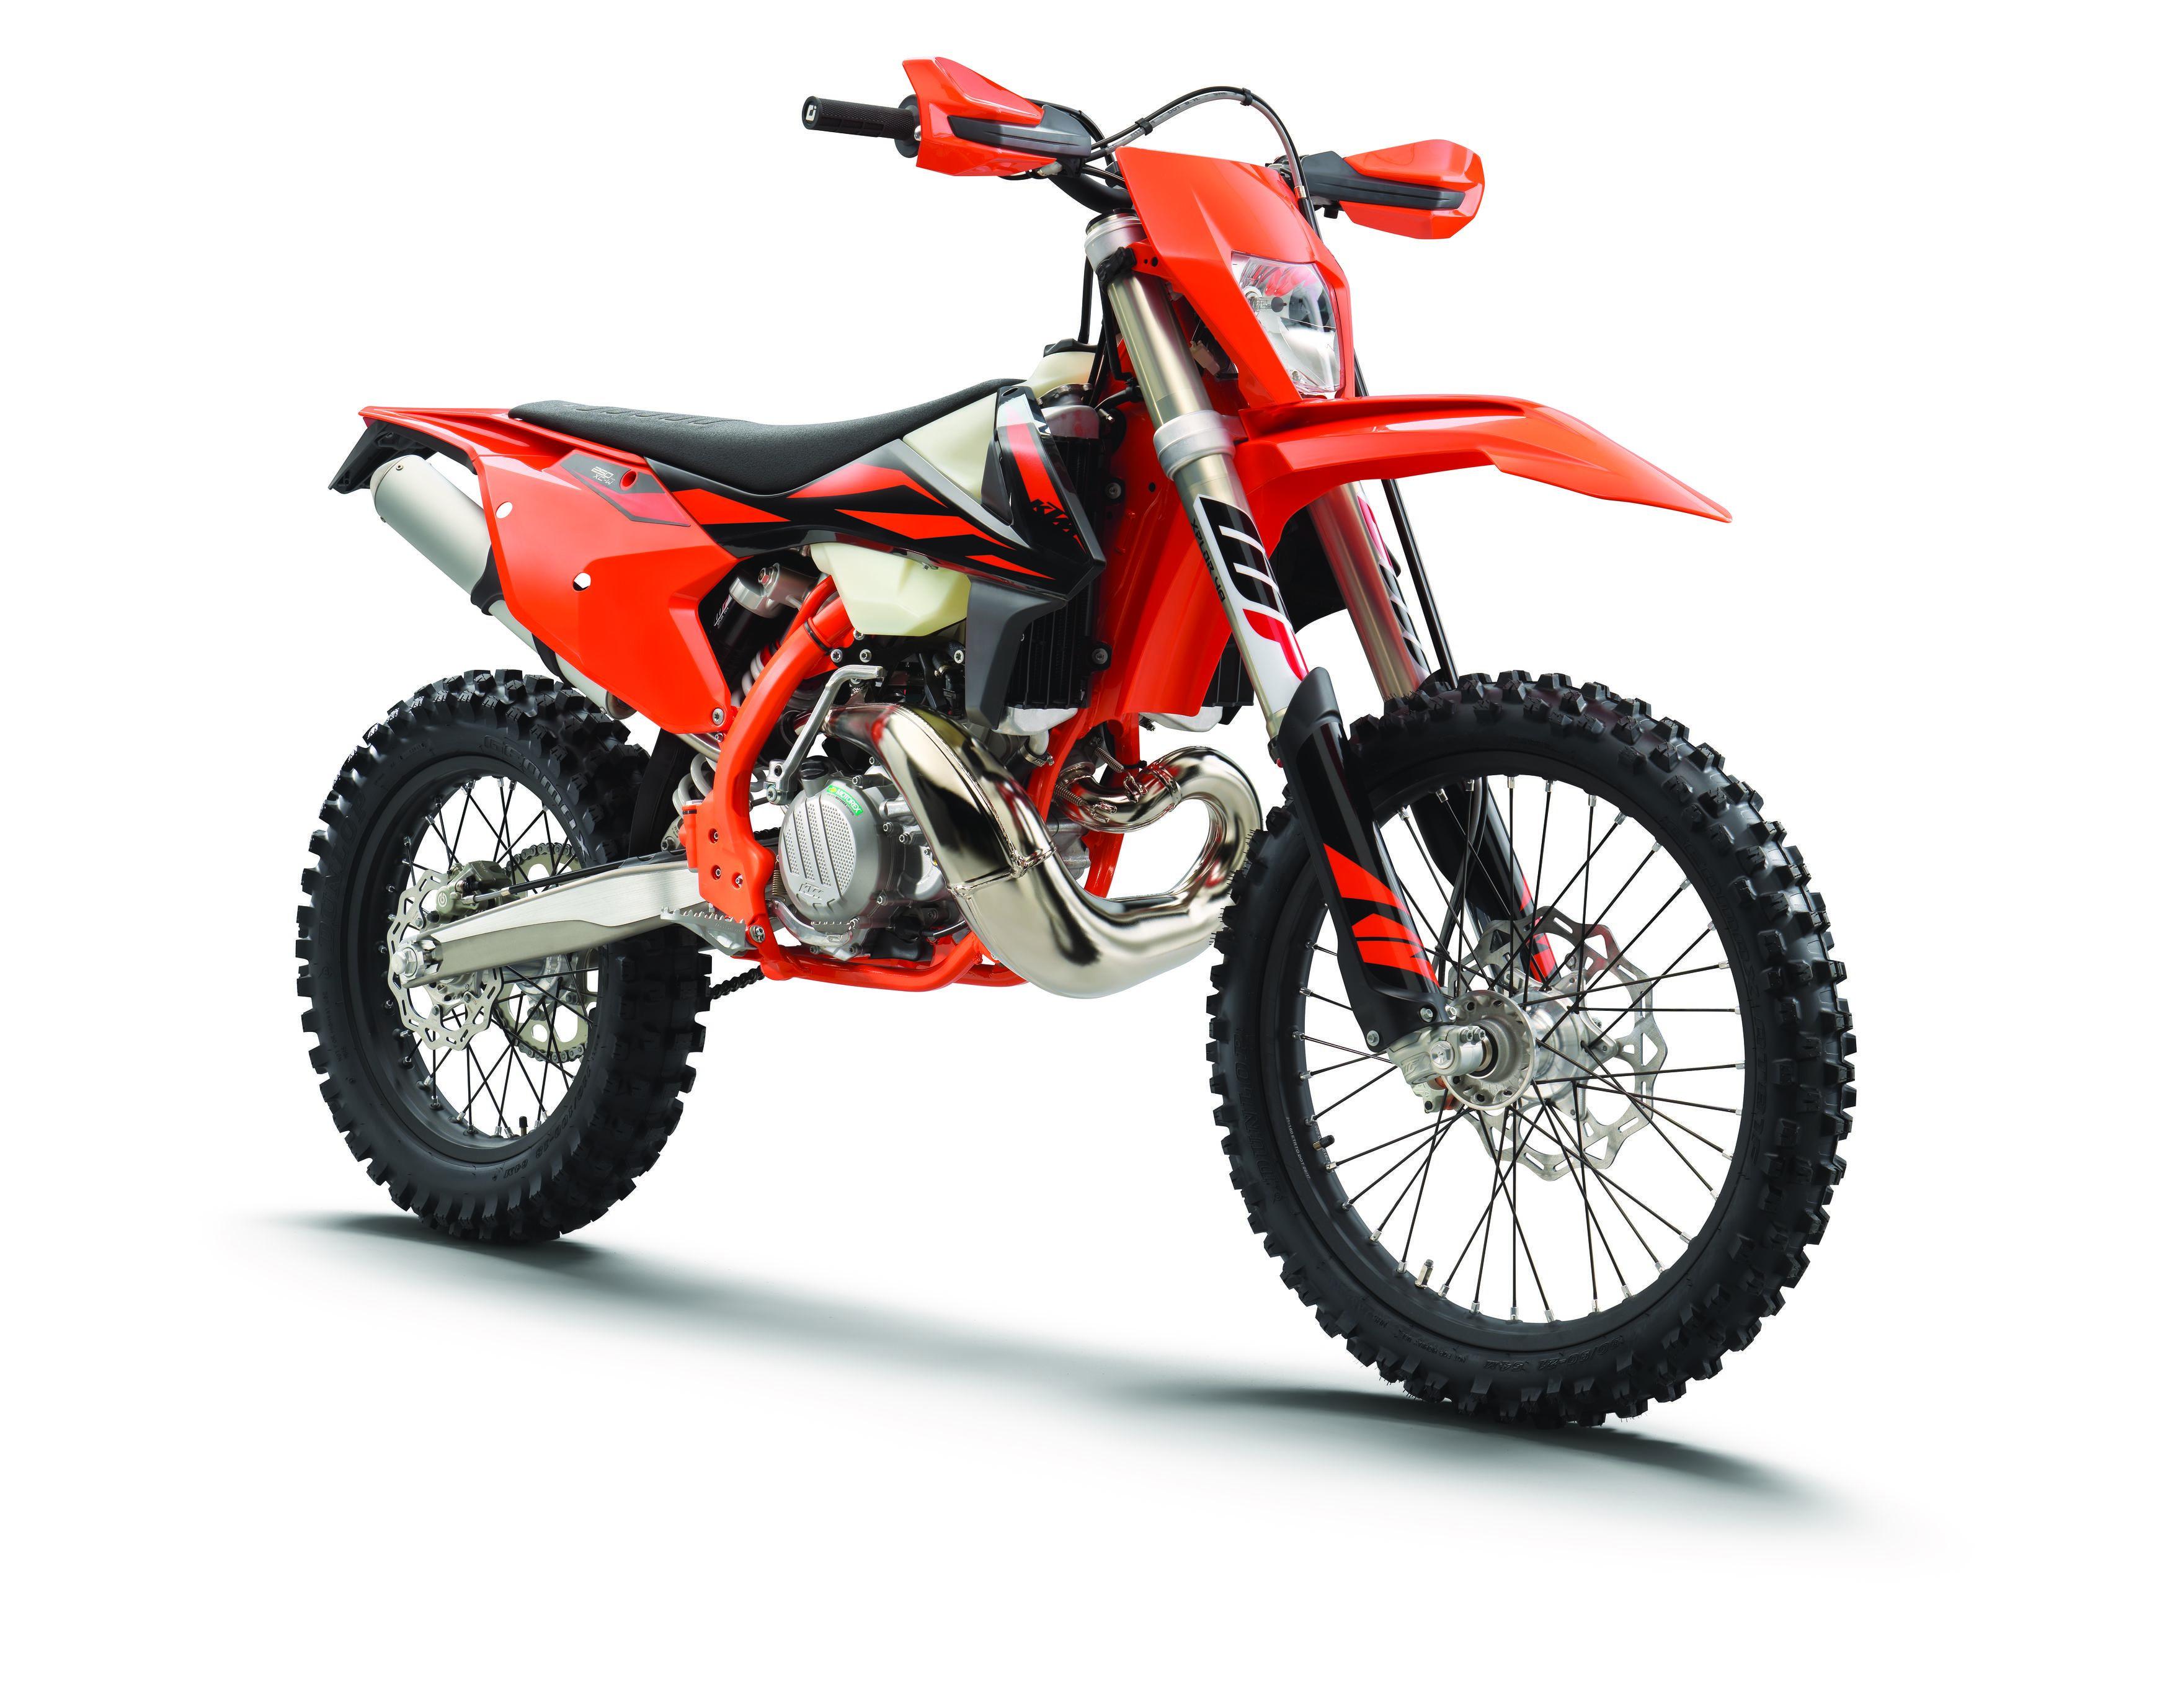 Ktm Xc W And Exc F Model Year 2019 Has Arrived Including The 300 Xc W Tpi 2 Stroke Motocross Bikes Ktm Ktm Dirt Bikes